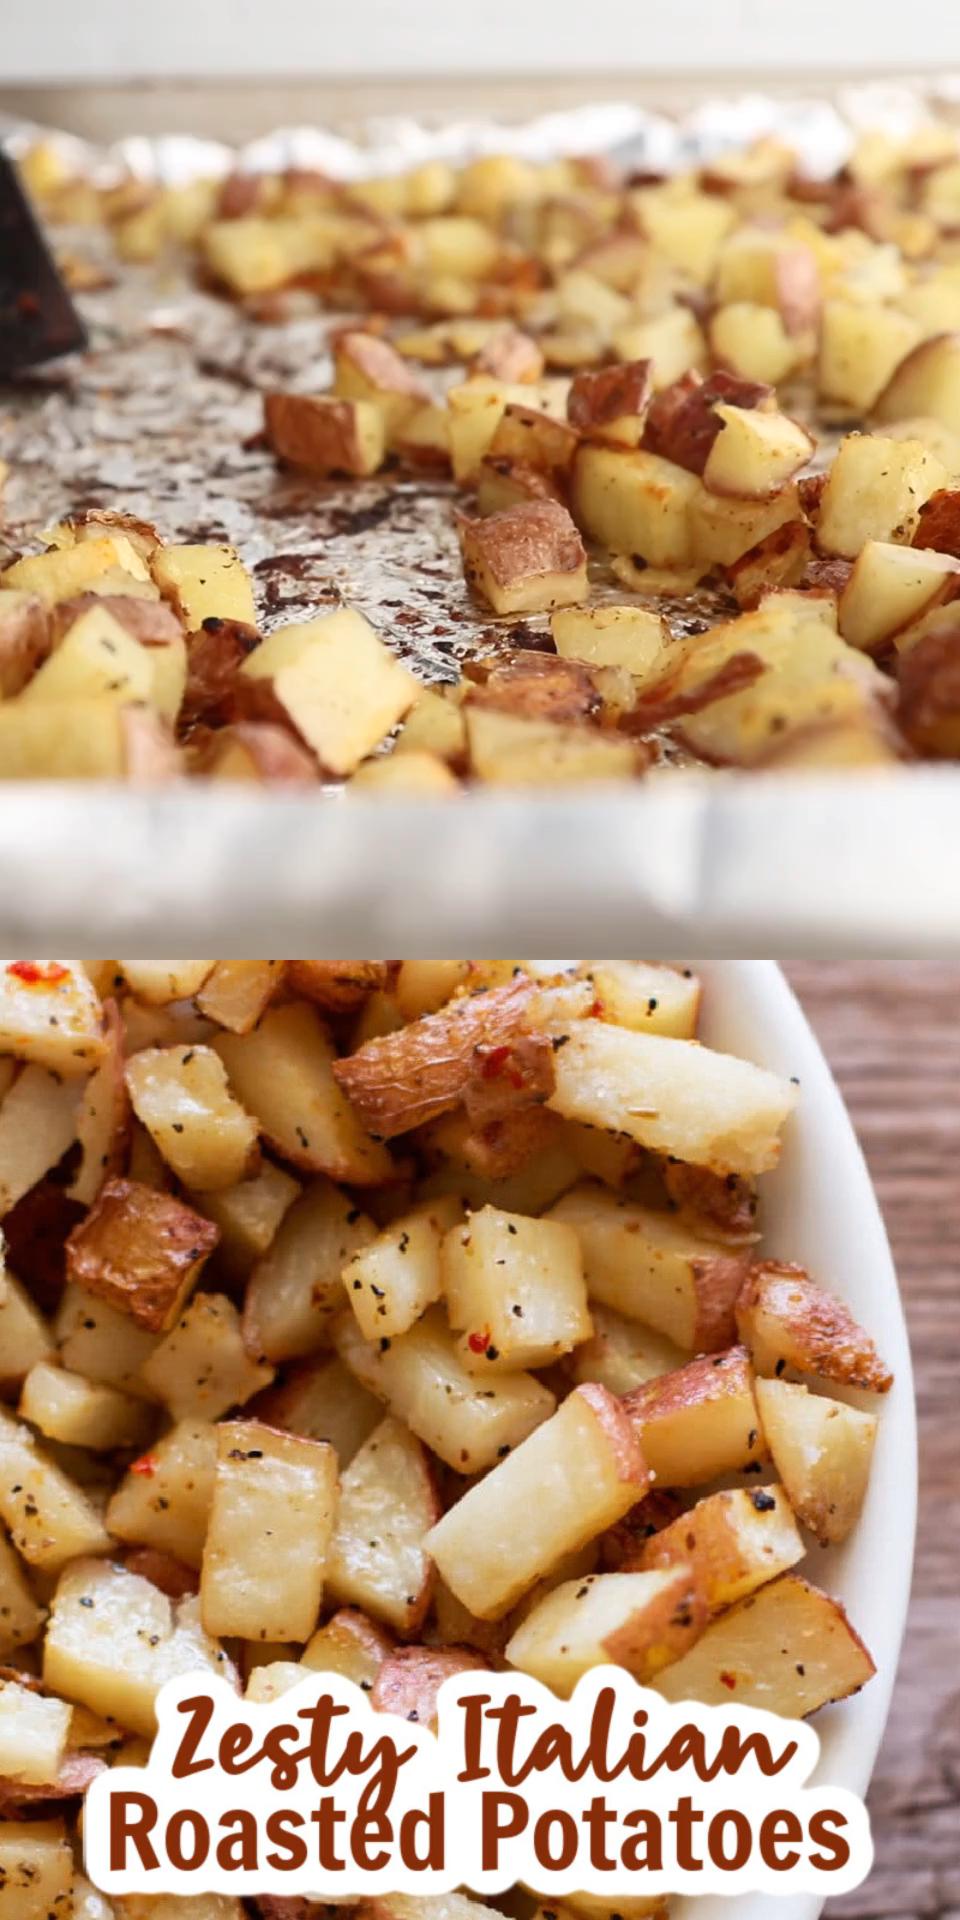 Zesty Italian Roasted Potatoes